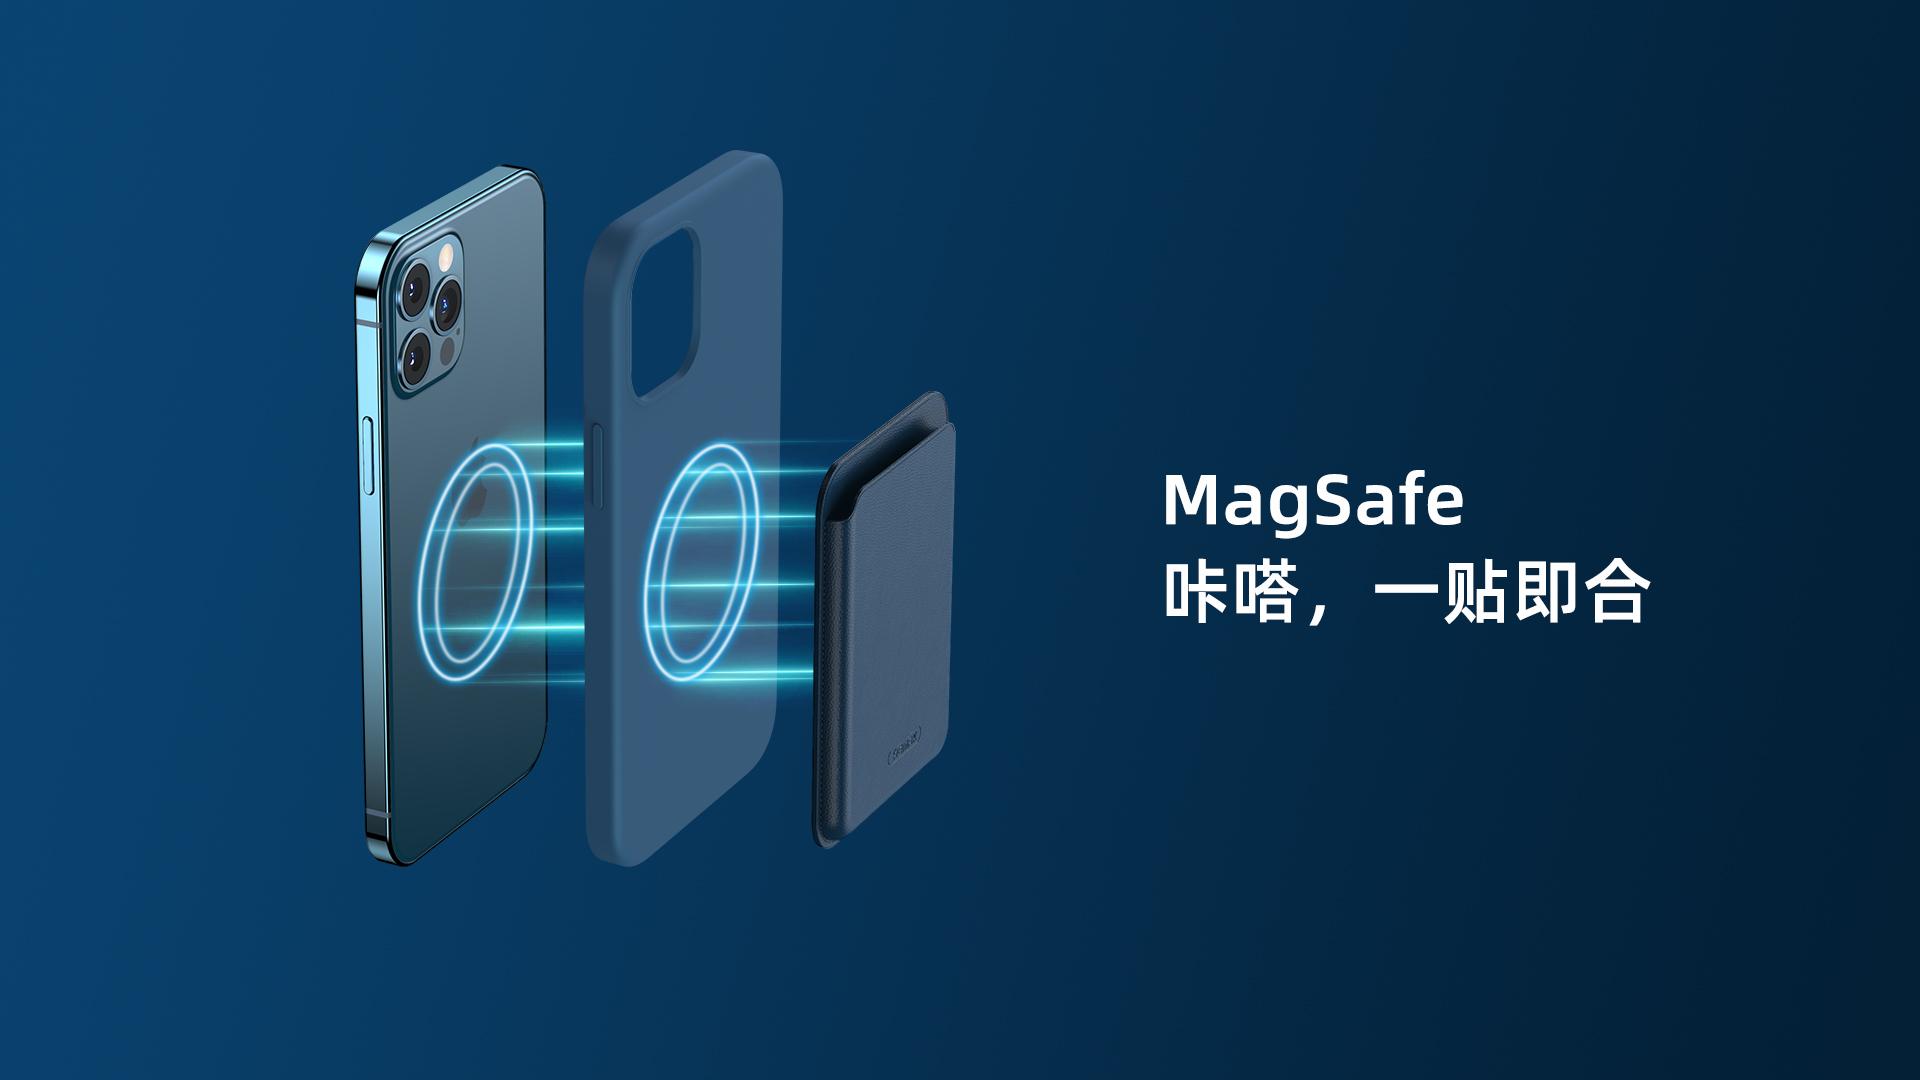 RM-1693-Magsafe磁吸真皮卡包-网页_04